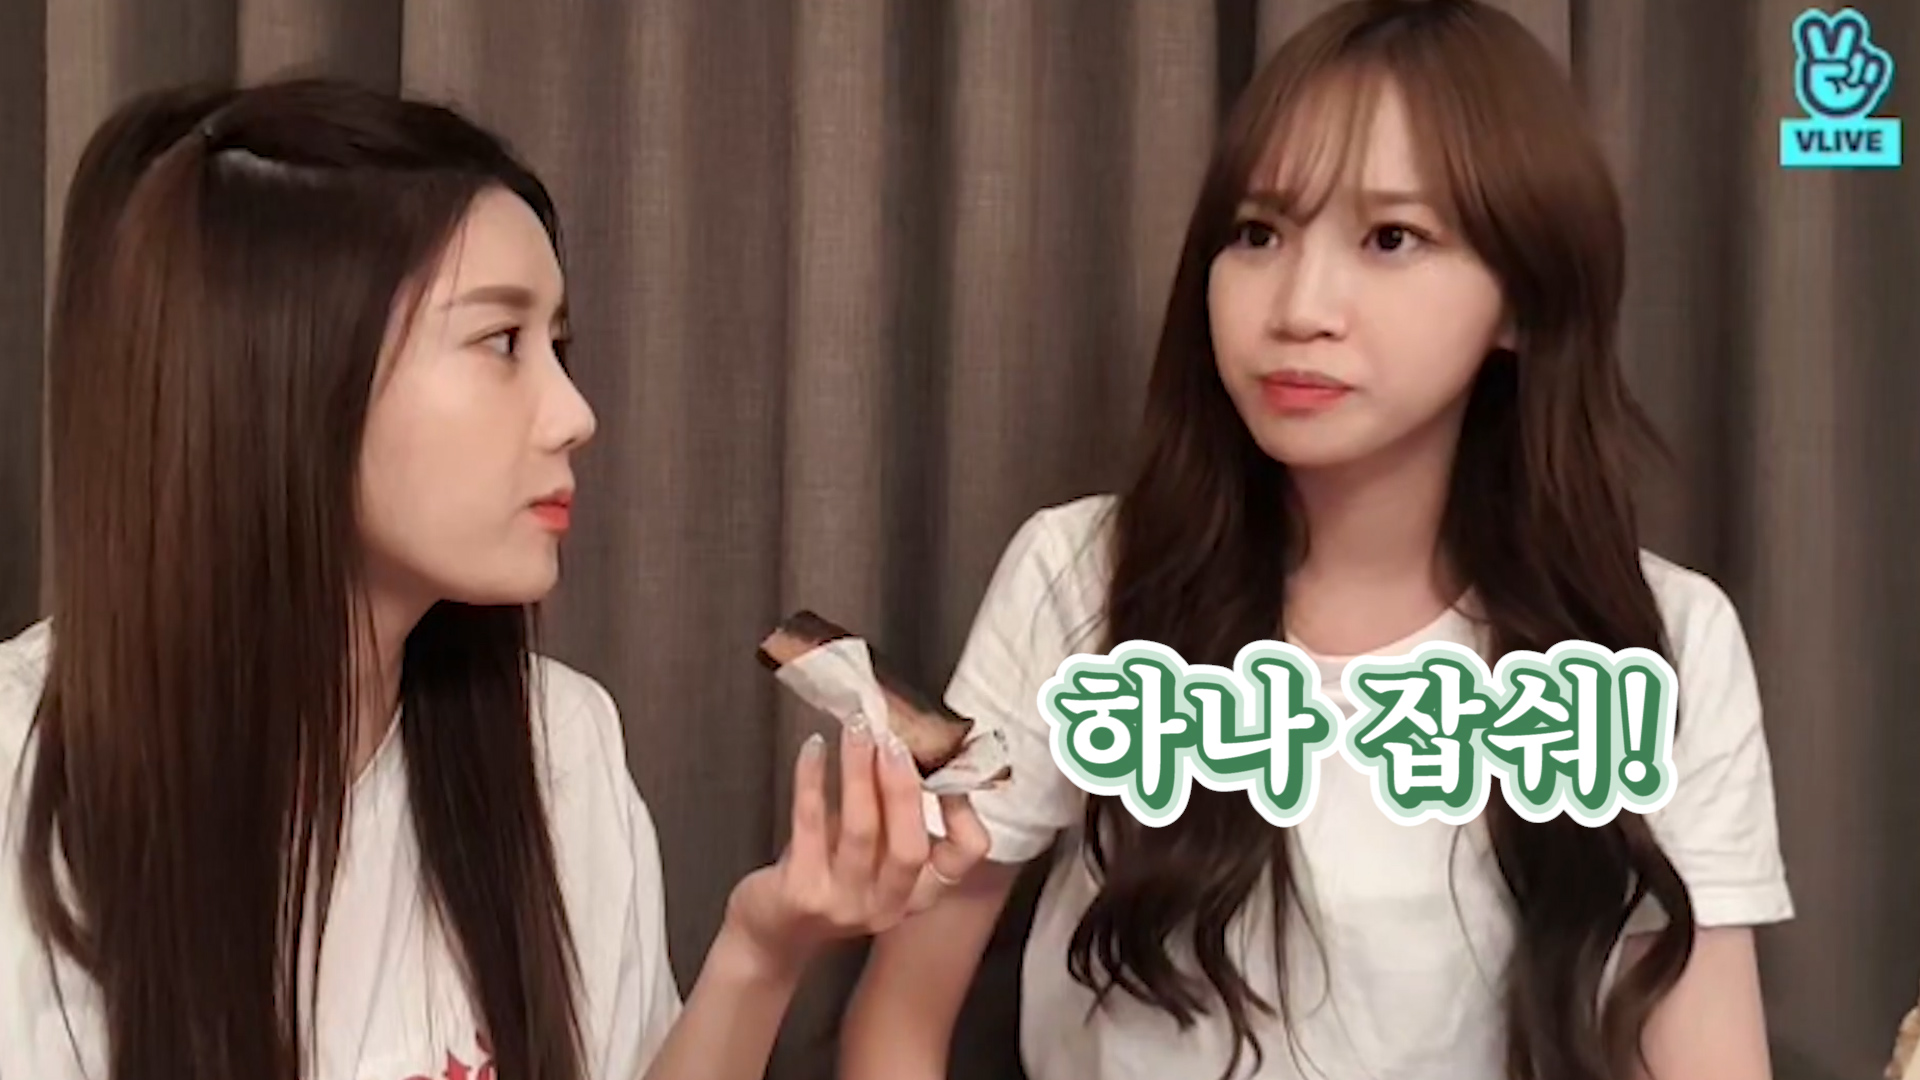 [IZ*ONE] 째비 케이크 하나 잡숴❣️ 옴뇸뇸 먹방에 심장 와아앙💕🍰 (EUNBI&CHAEWON eating cherry and cake)